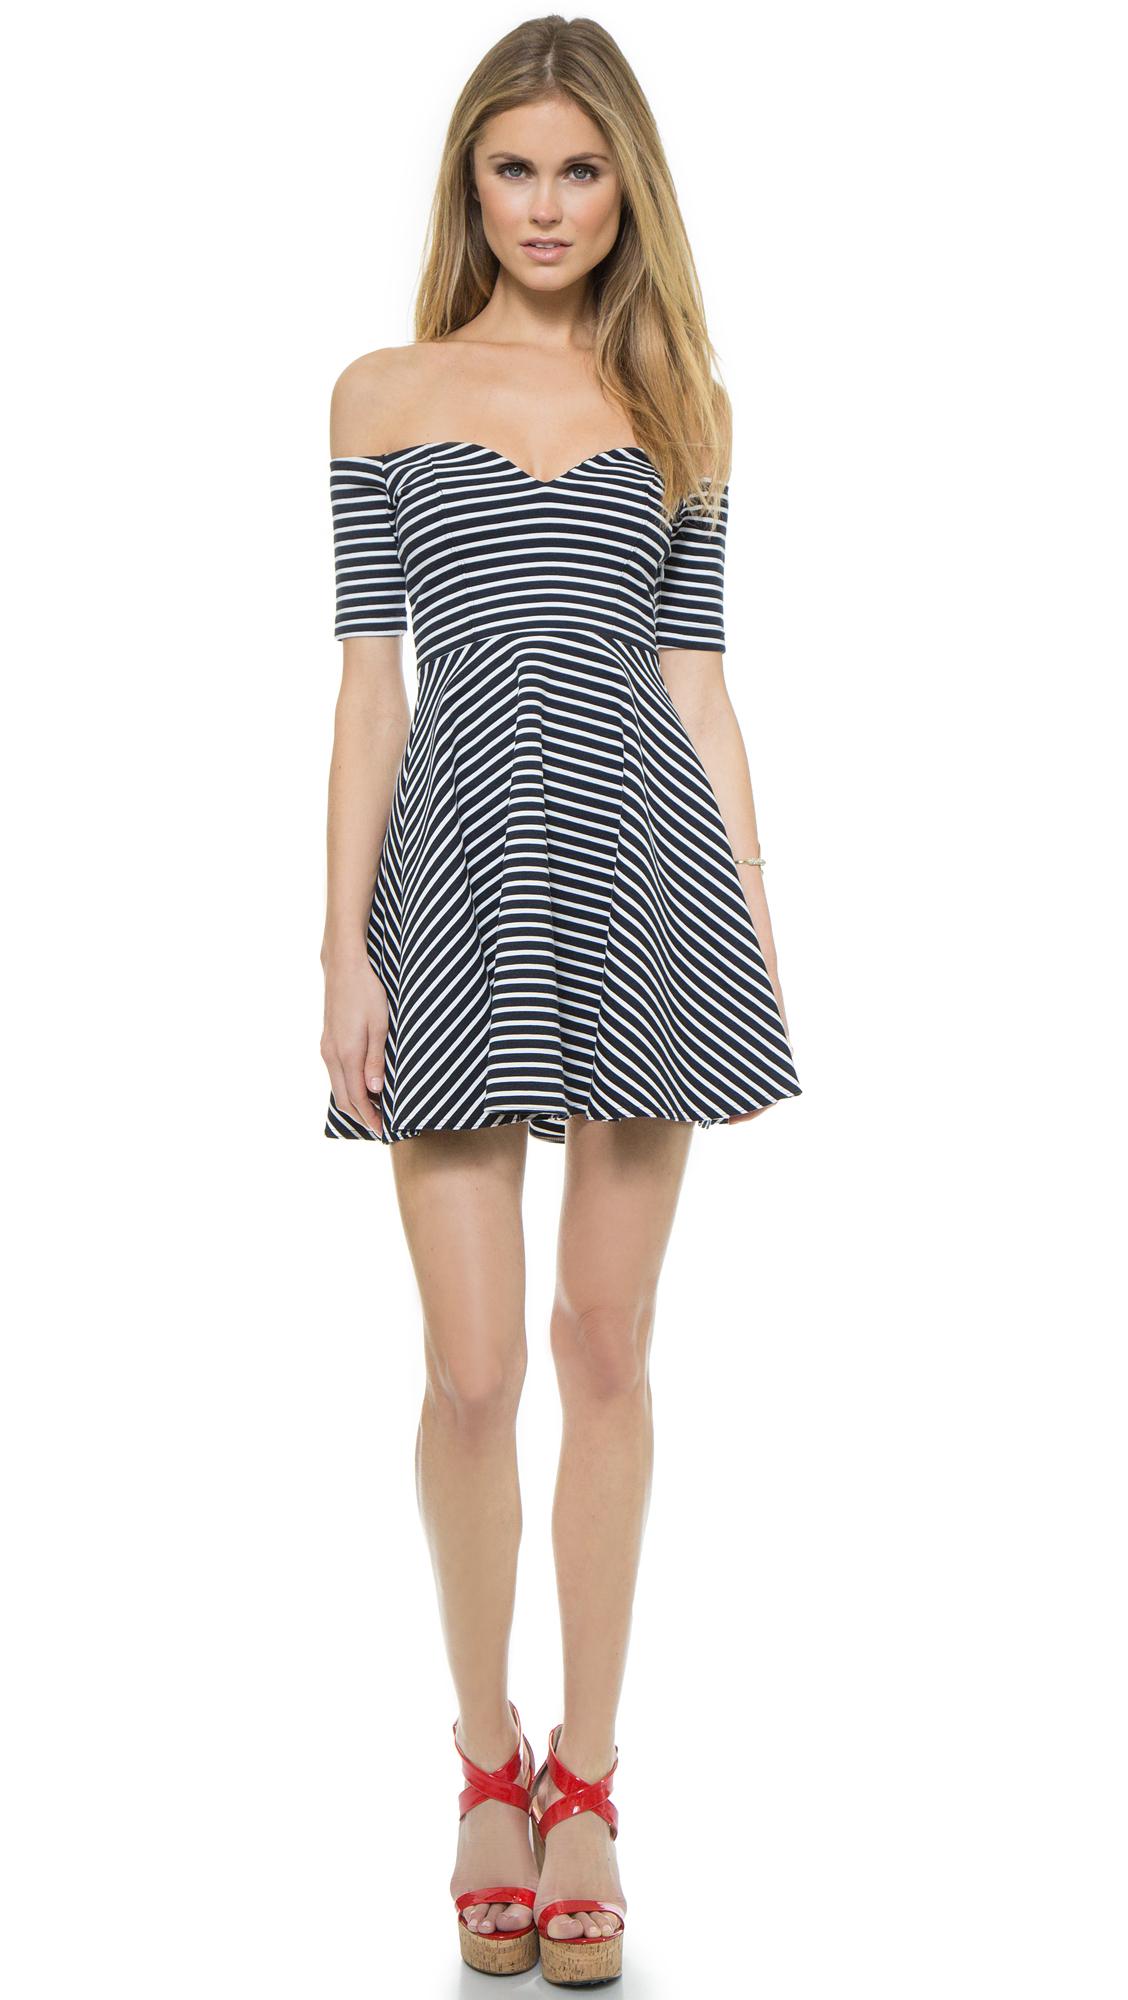 Lyst - RED Valentino Off Shoulder Stripe Dress in Blue 68b28ab3b